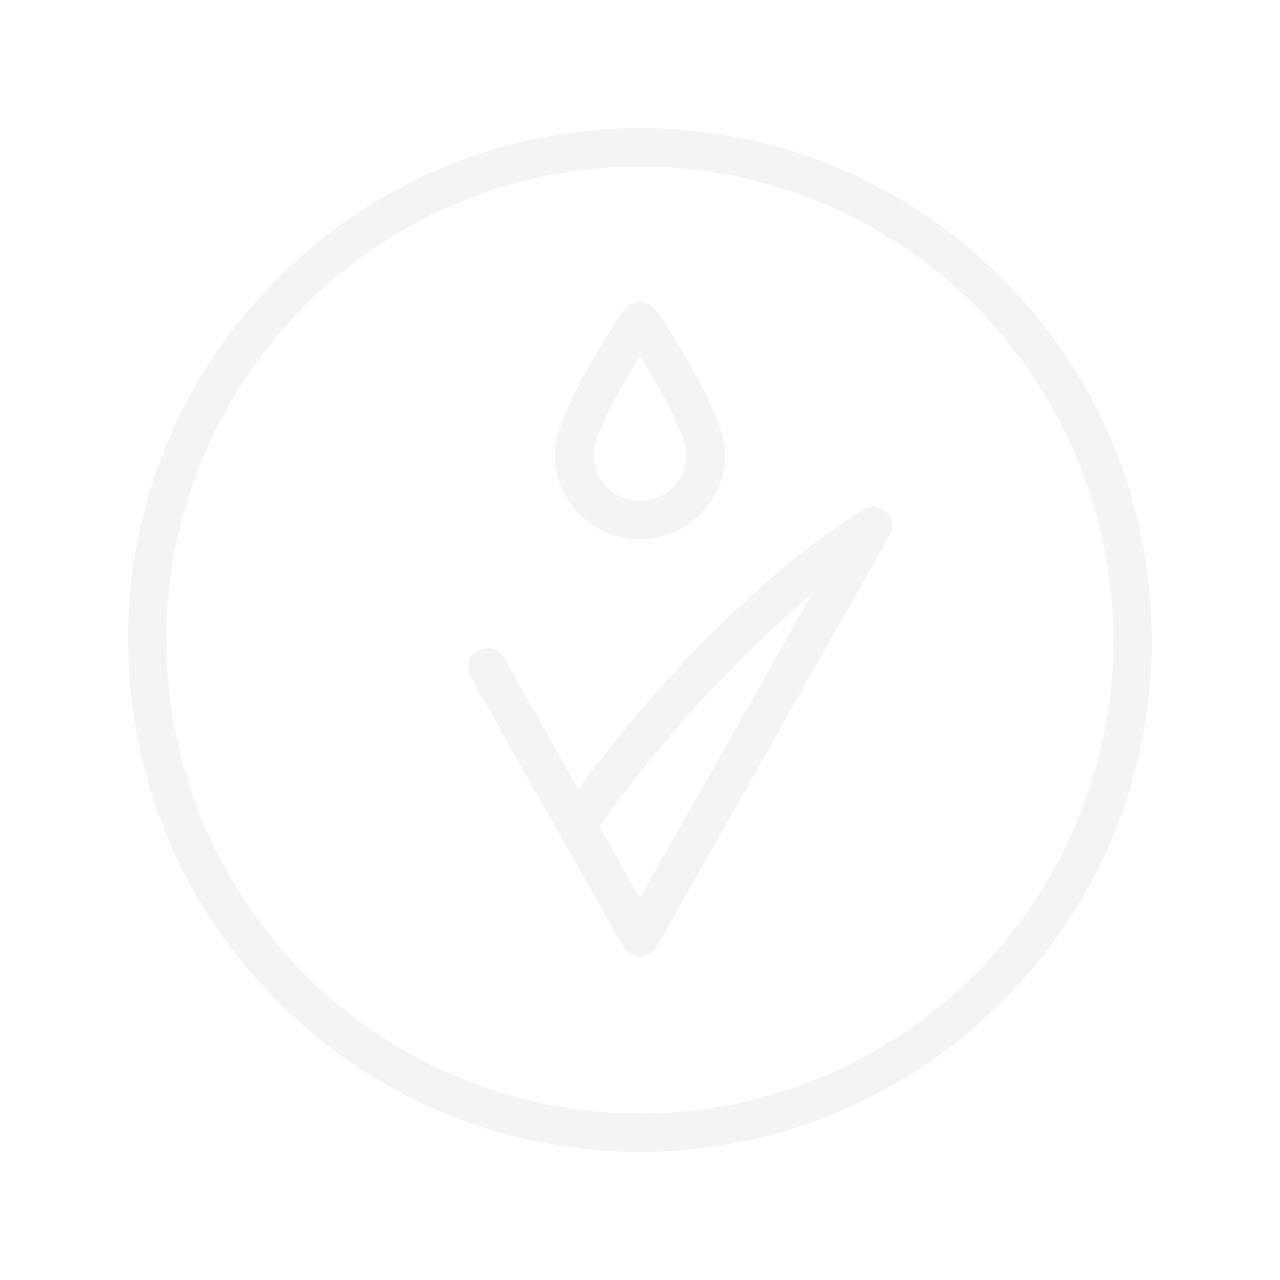 TINTS OF NATURE Henna Cream Dark Brown 70ml